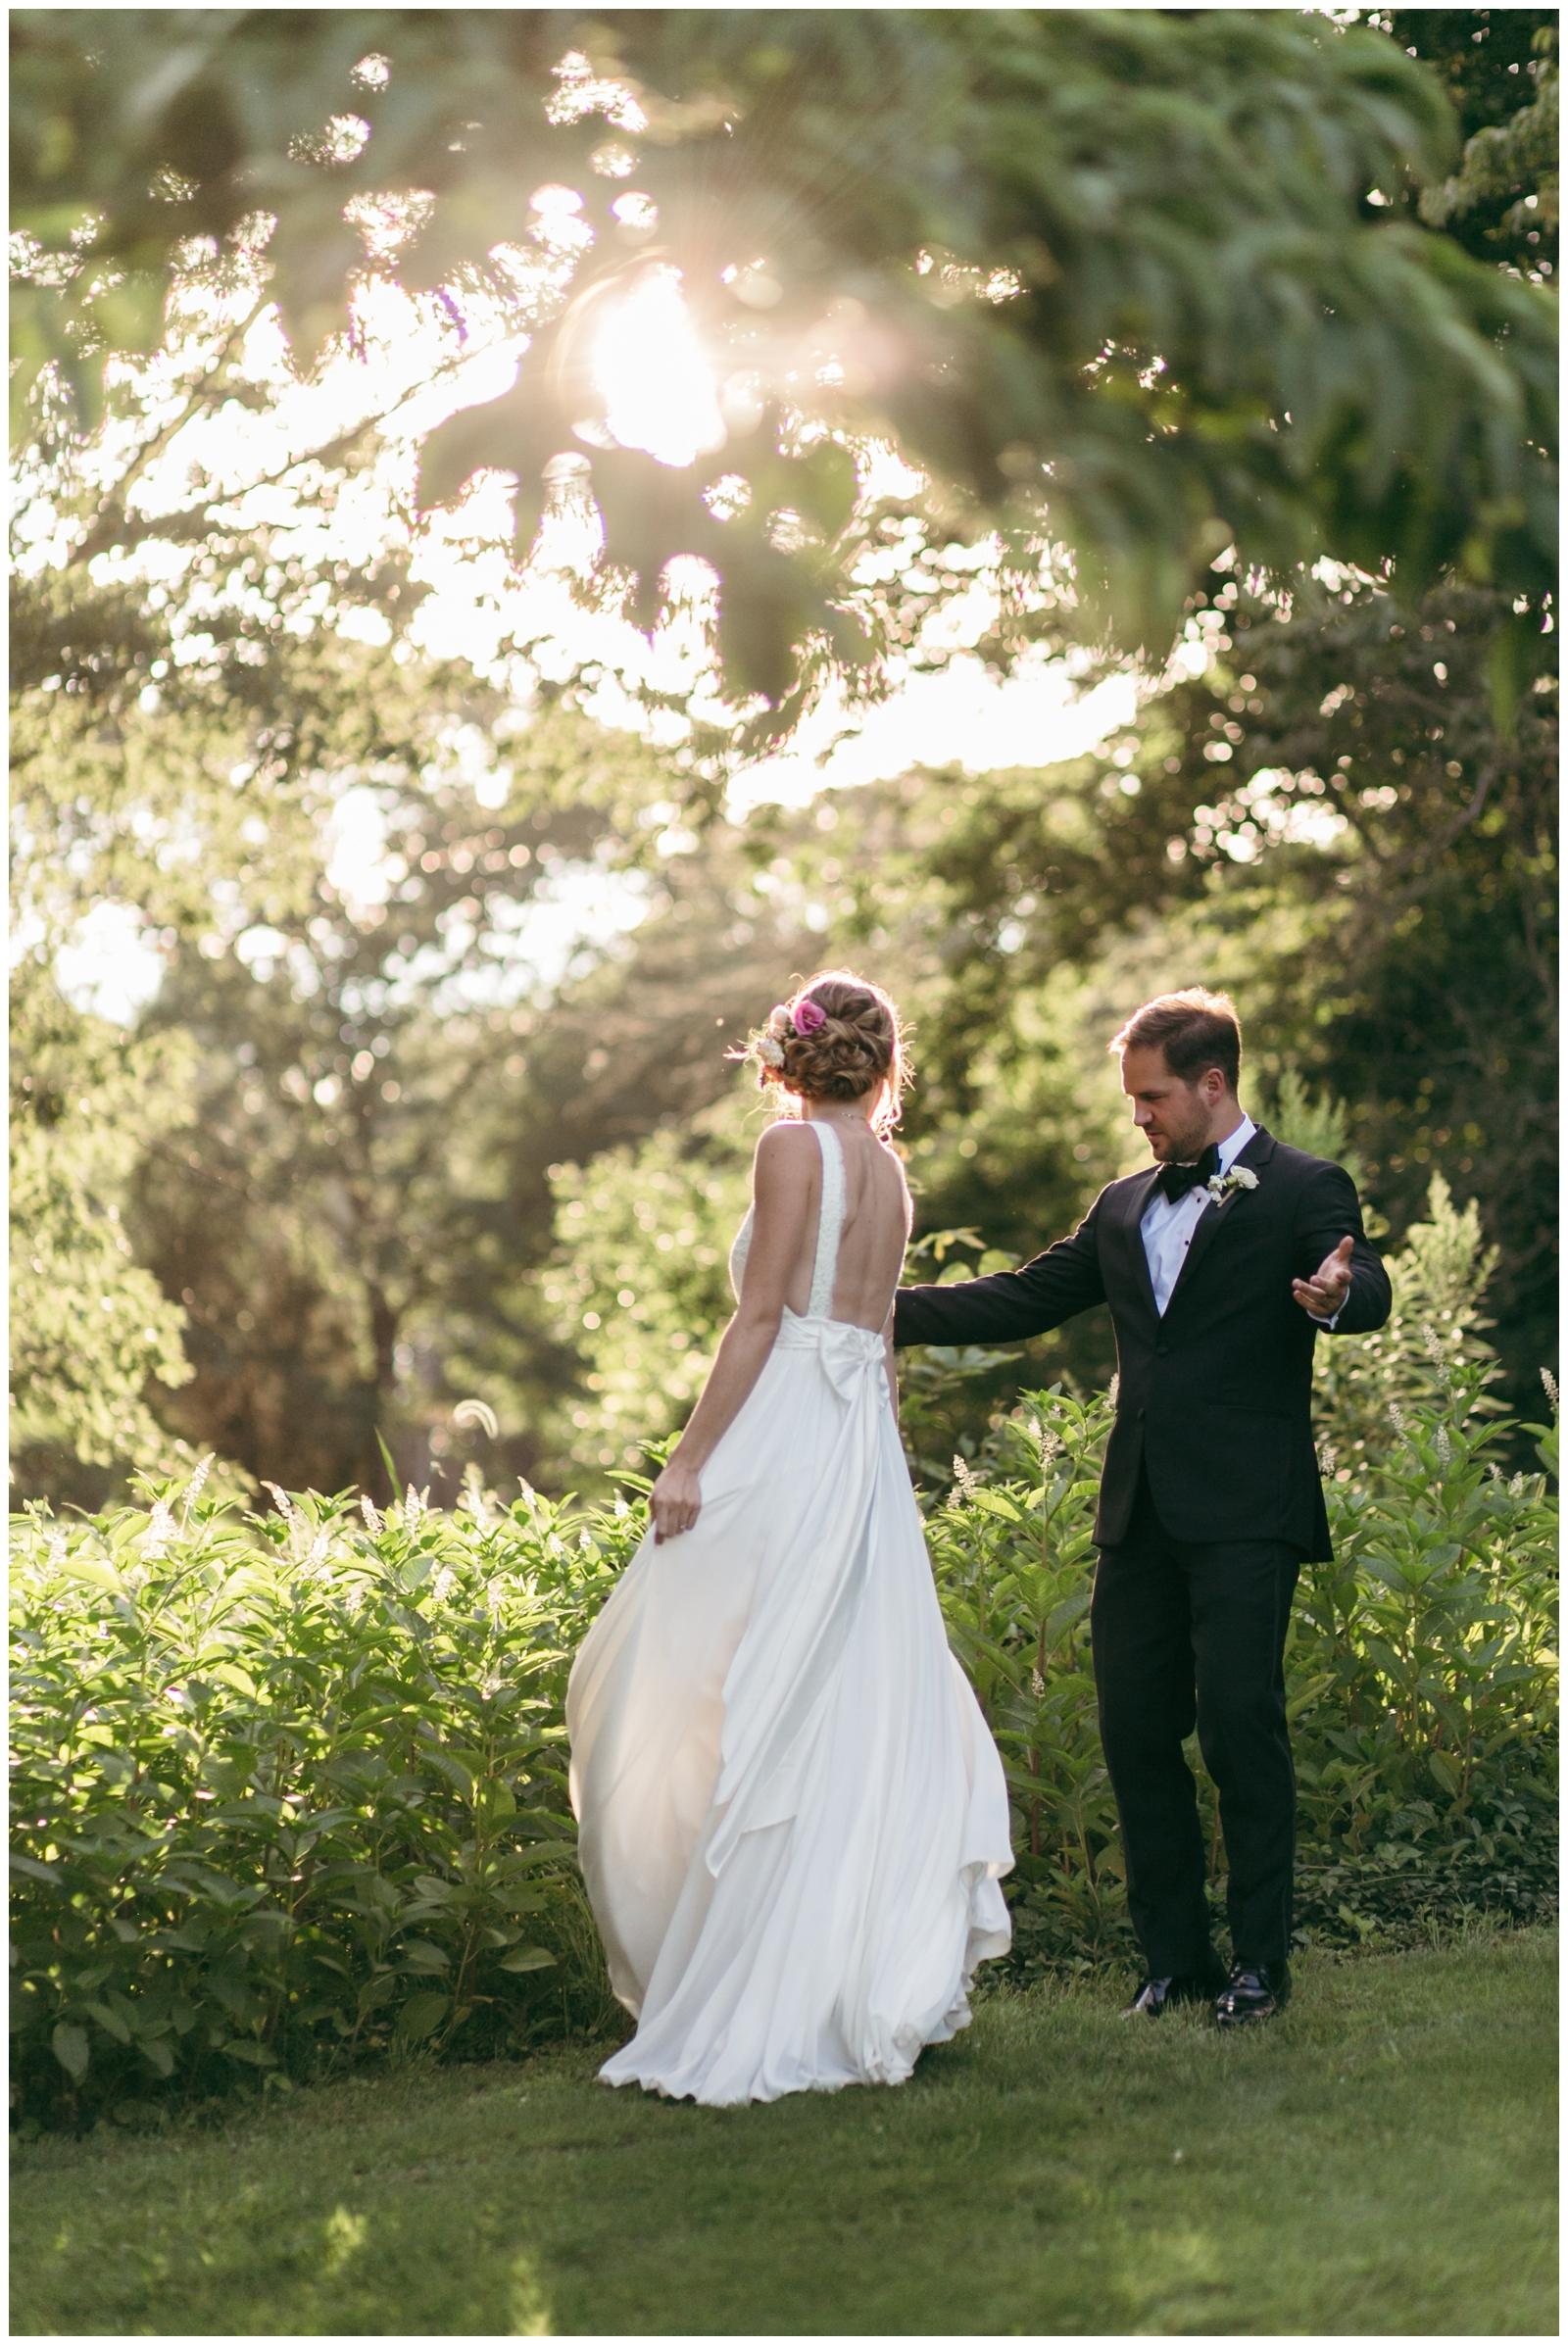 Moraine-Farm-wedding-Bailey-Q-Photo-Massachusetts-wedding-photpgrapher-107.jpg